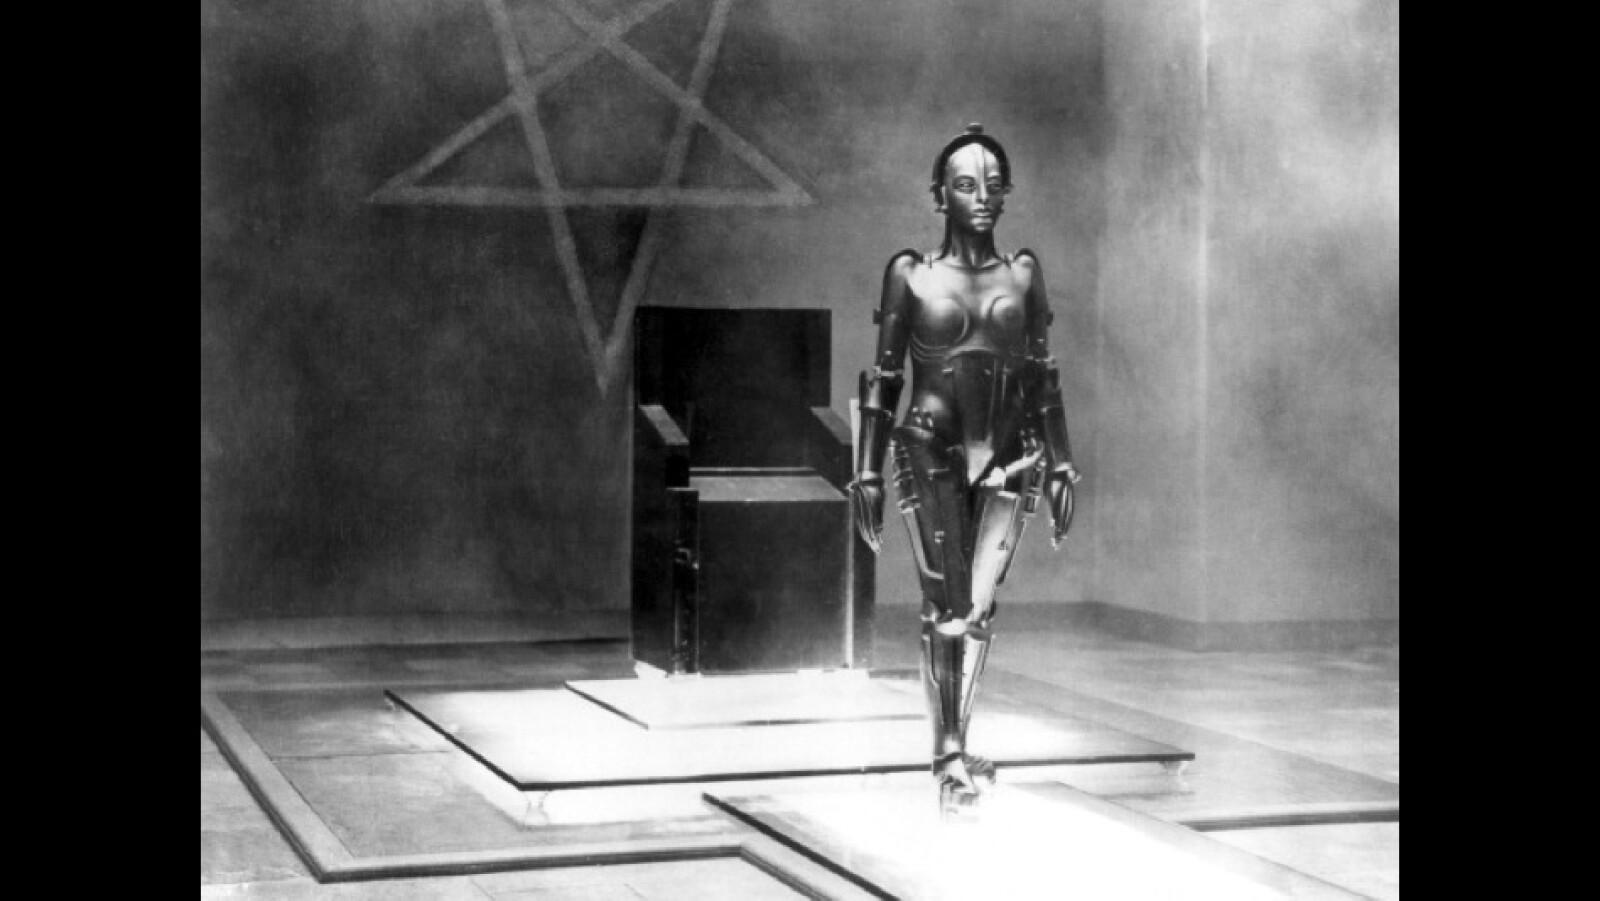 ?Maschinenmensch?, en la película clásica de 1927, ?Metropolis?, dirigda por Fritz Lang